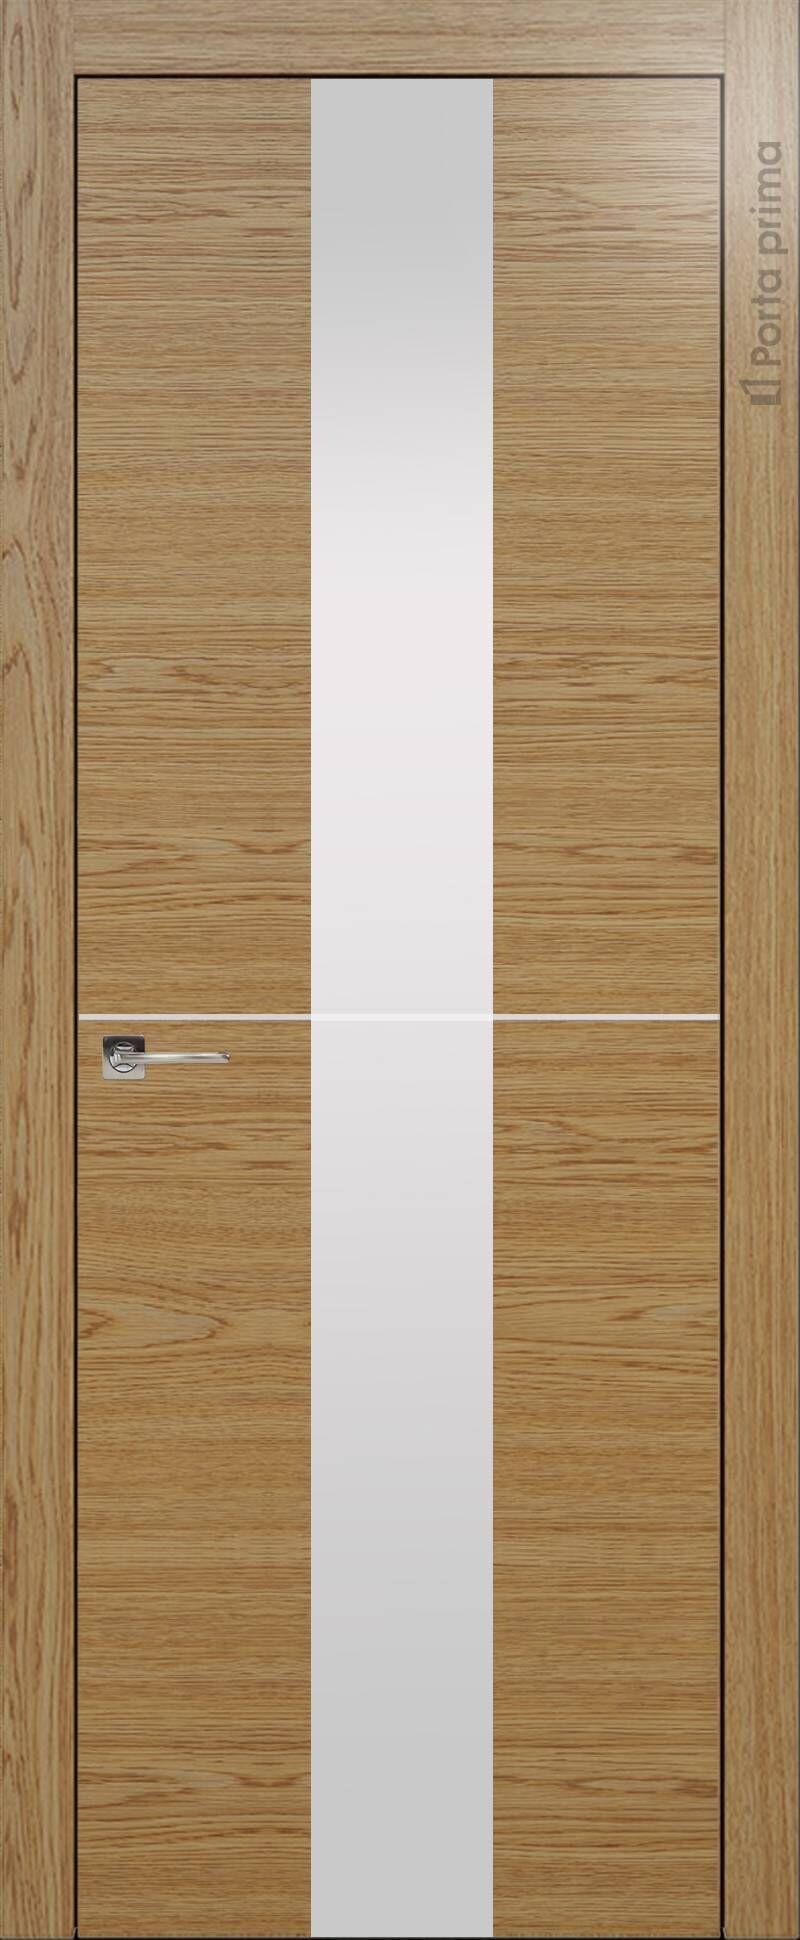 Tivoli Ж-3 цвет - Дуб карамель Со стеклом (ДО)